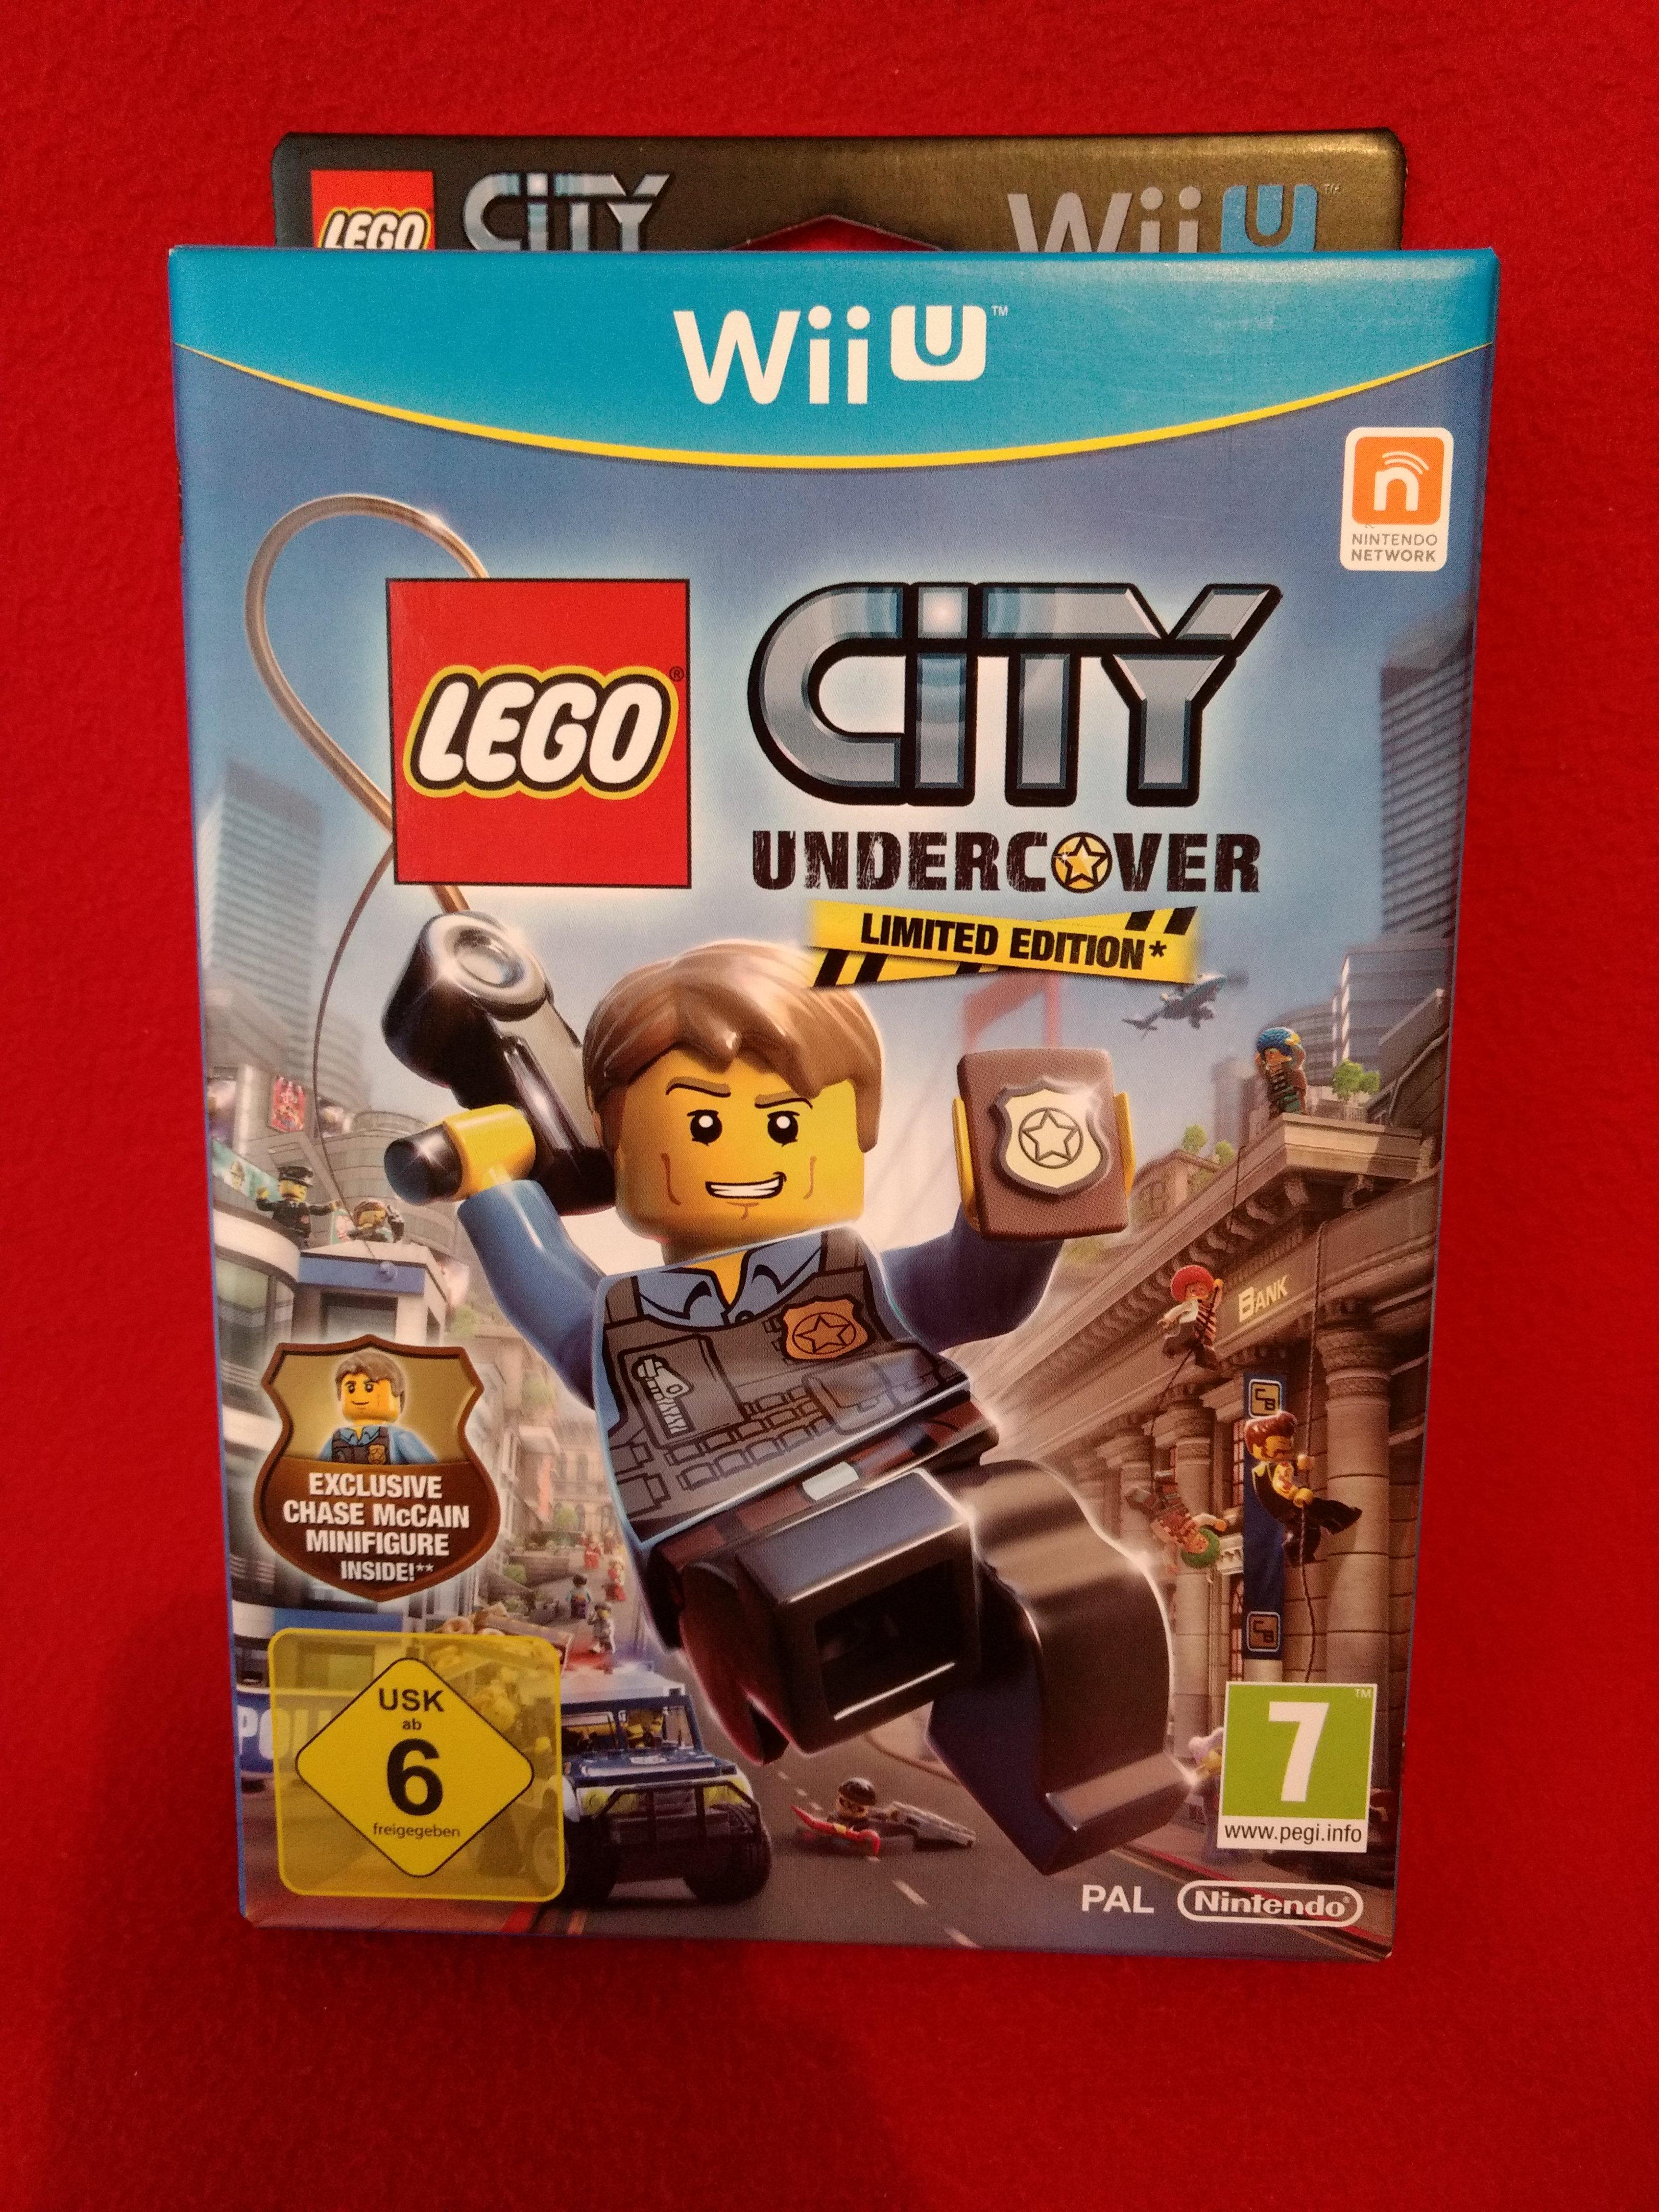 [ESTIM] LEGO UNDERCOVER CITY WII U LIMITED 171231110221324812